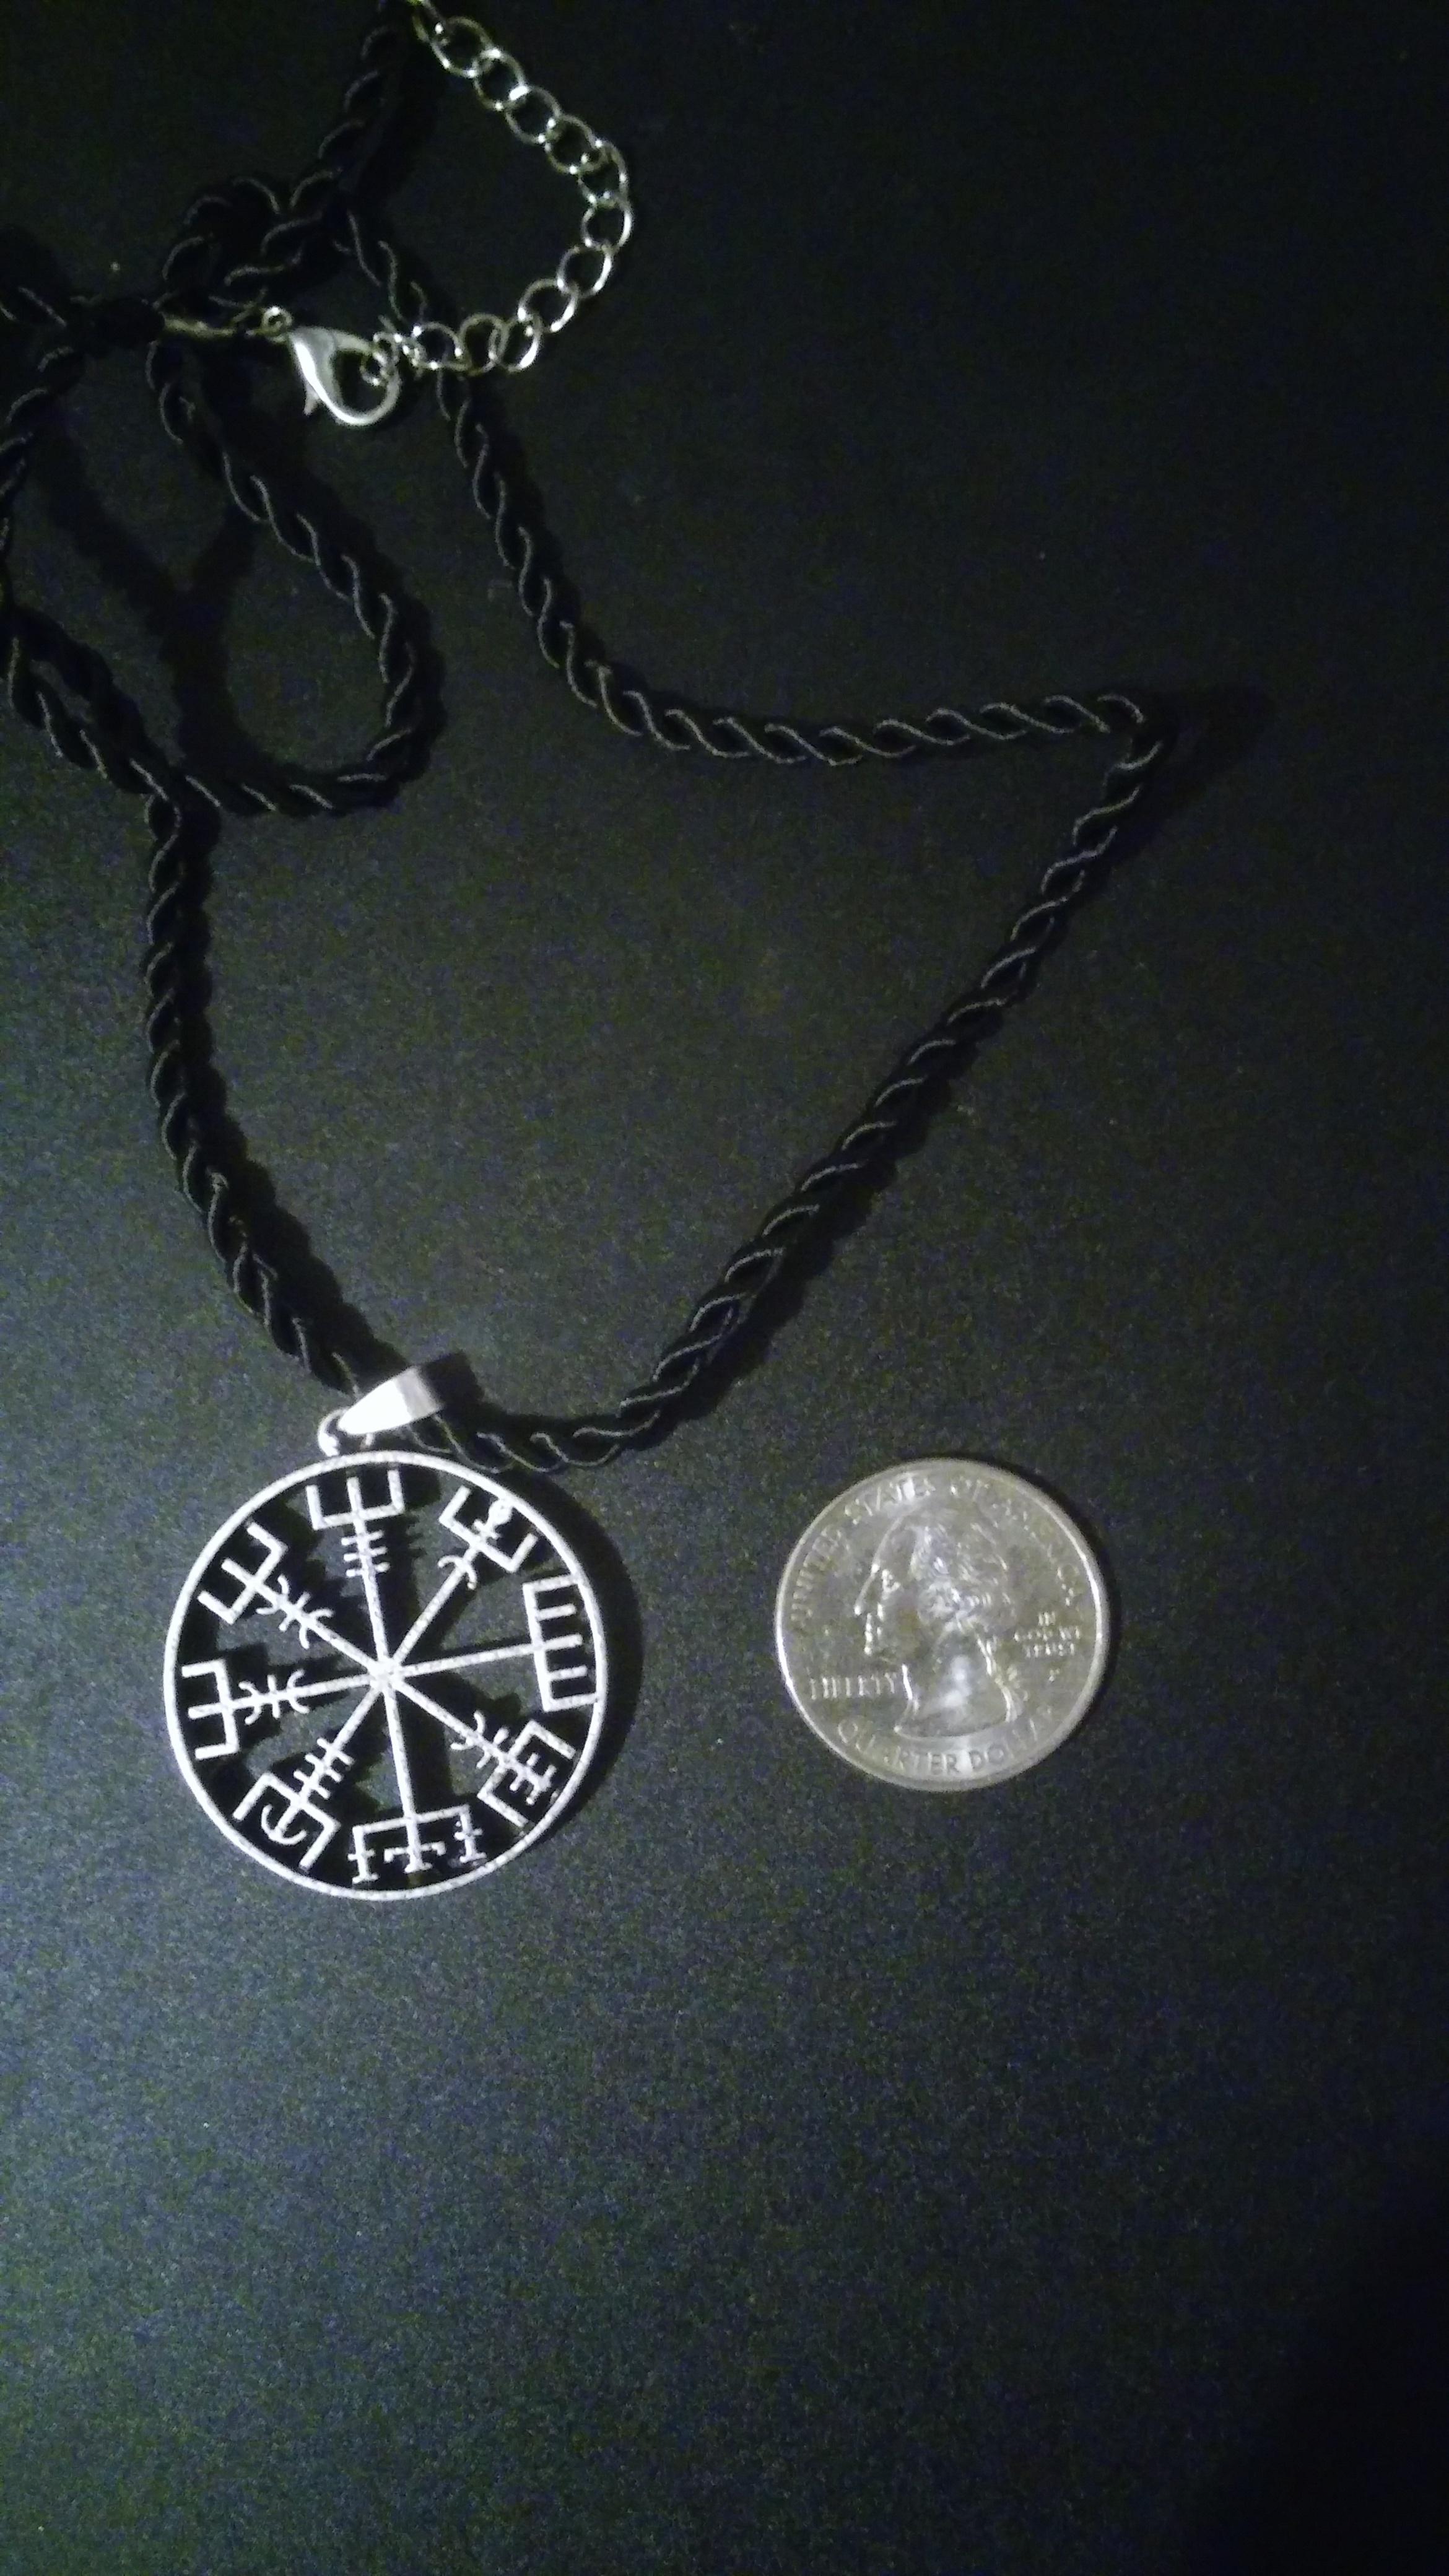 Helm of awe necklace label56 yahoo aloadofball Images